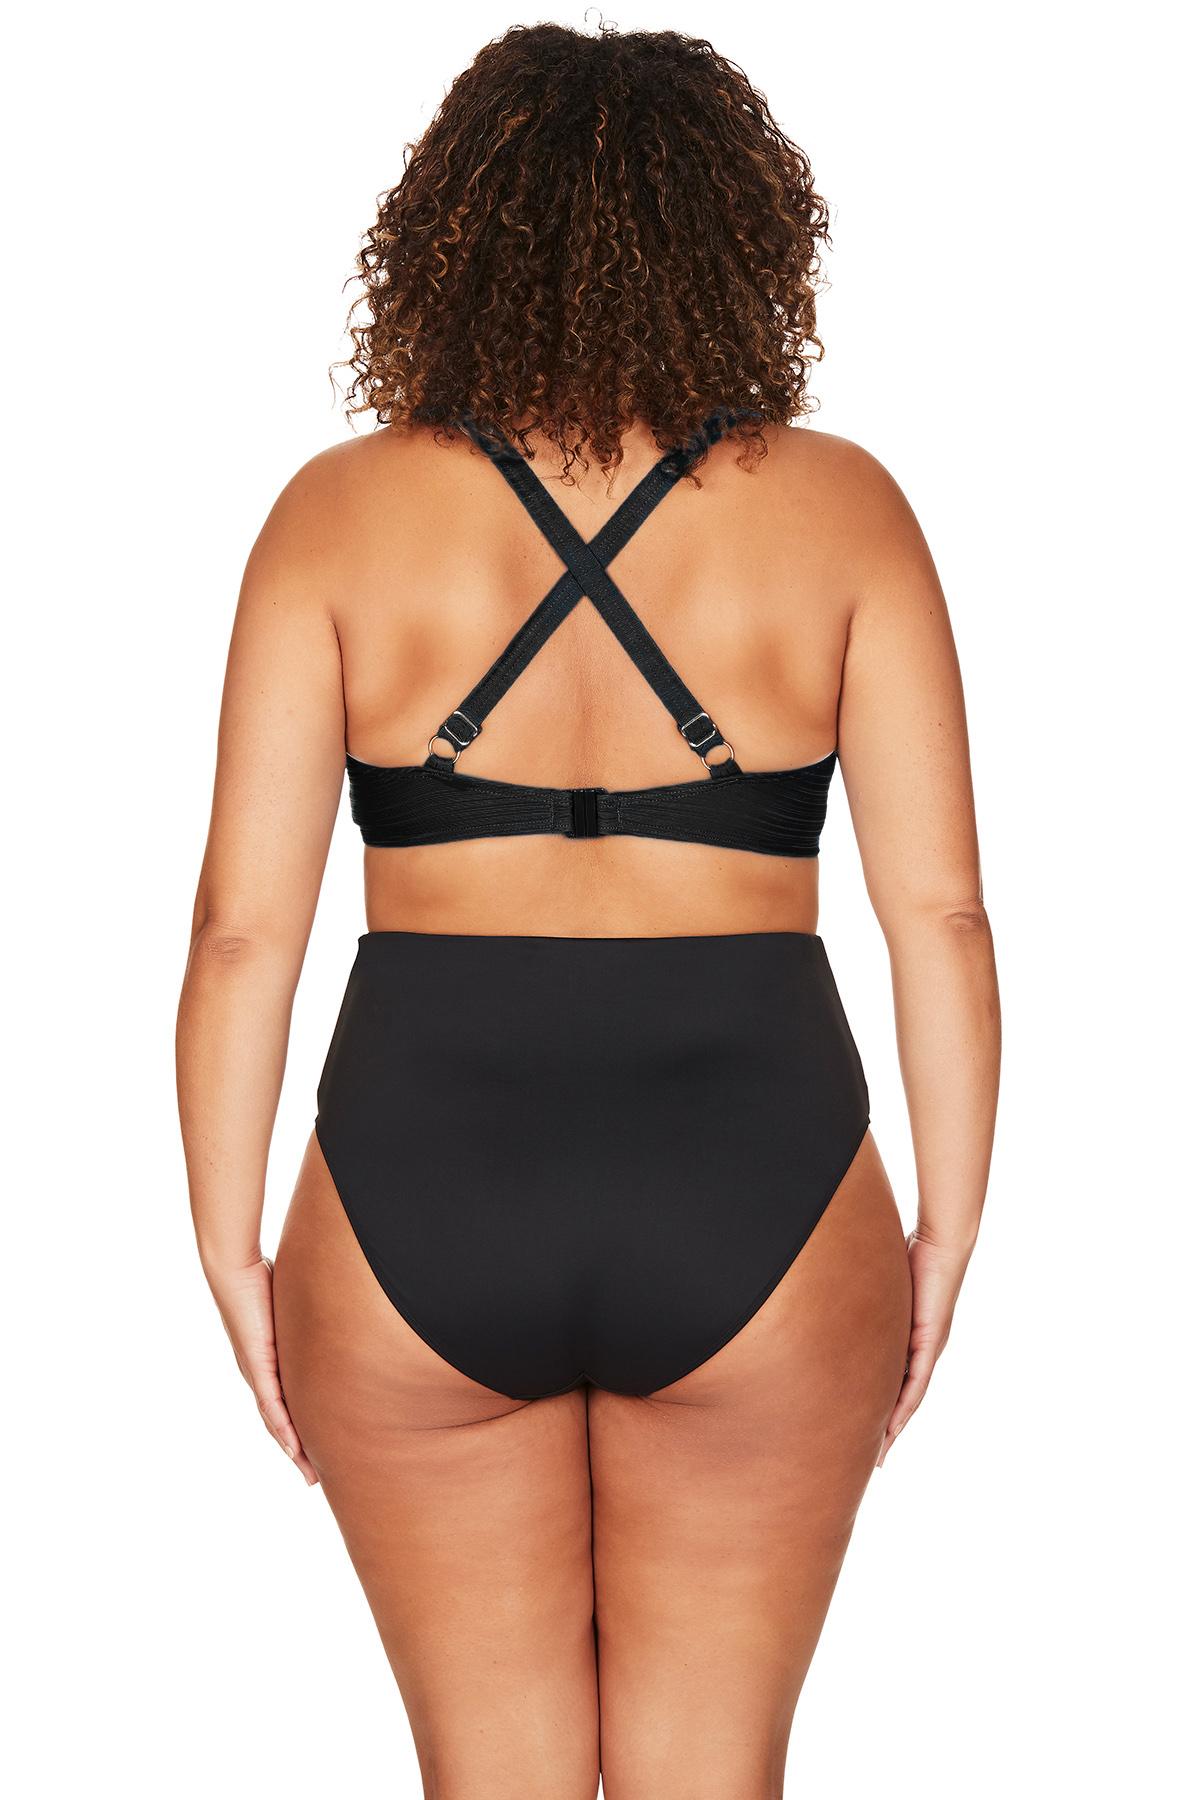 Artesands plus size swimwear